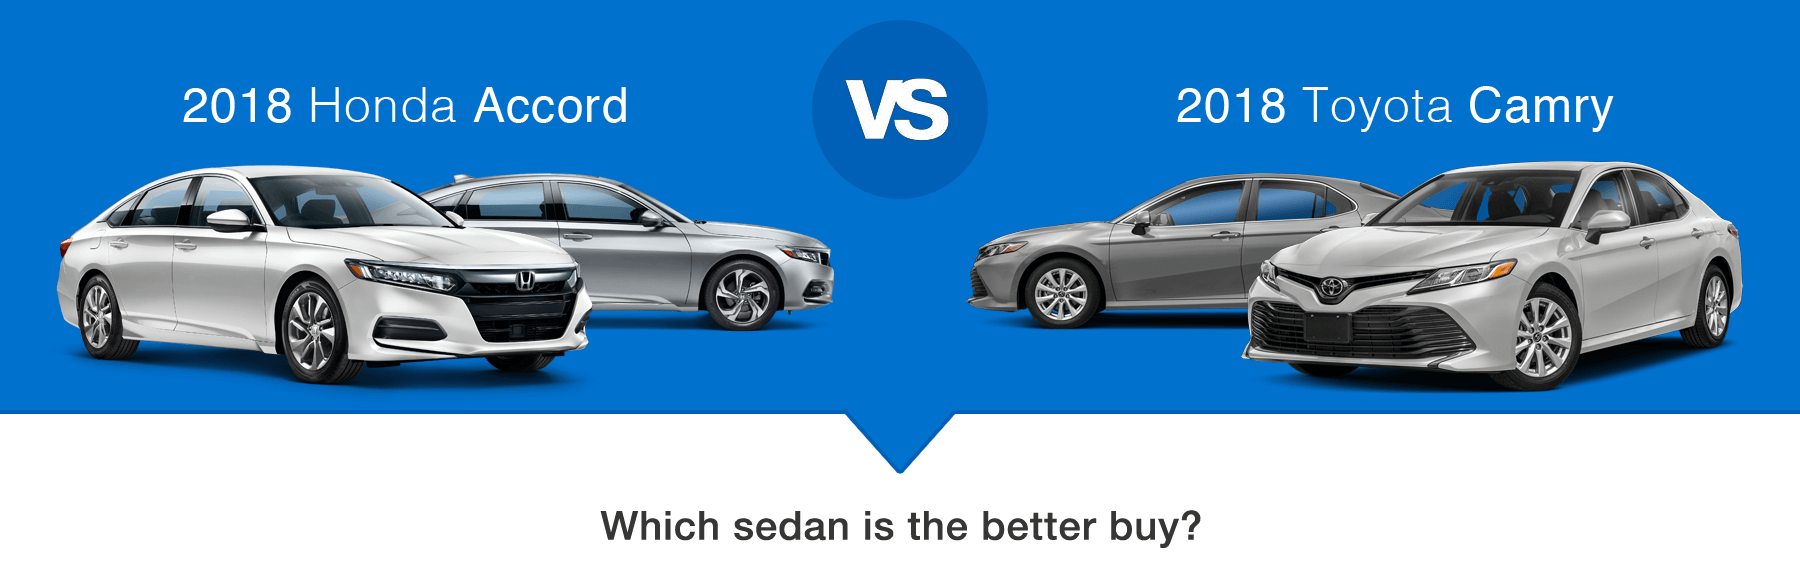 2018 Honda Accord vs 2018 Toyota Camry Which Sedan is the better buy?